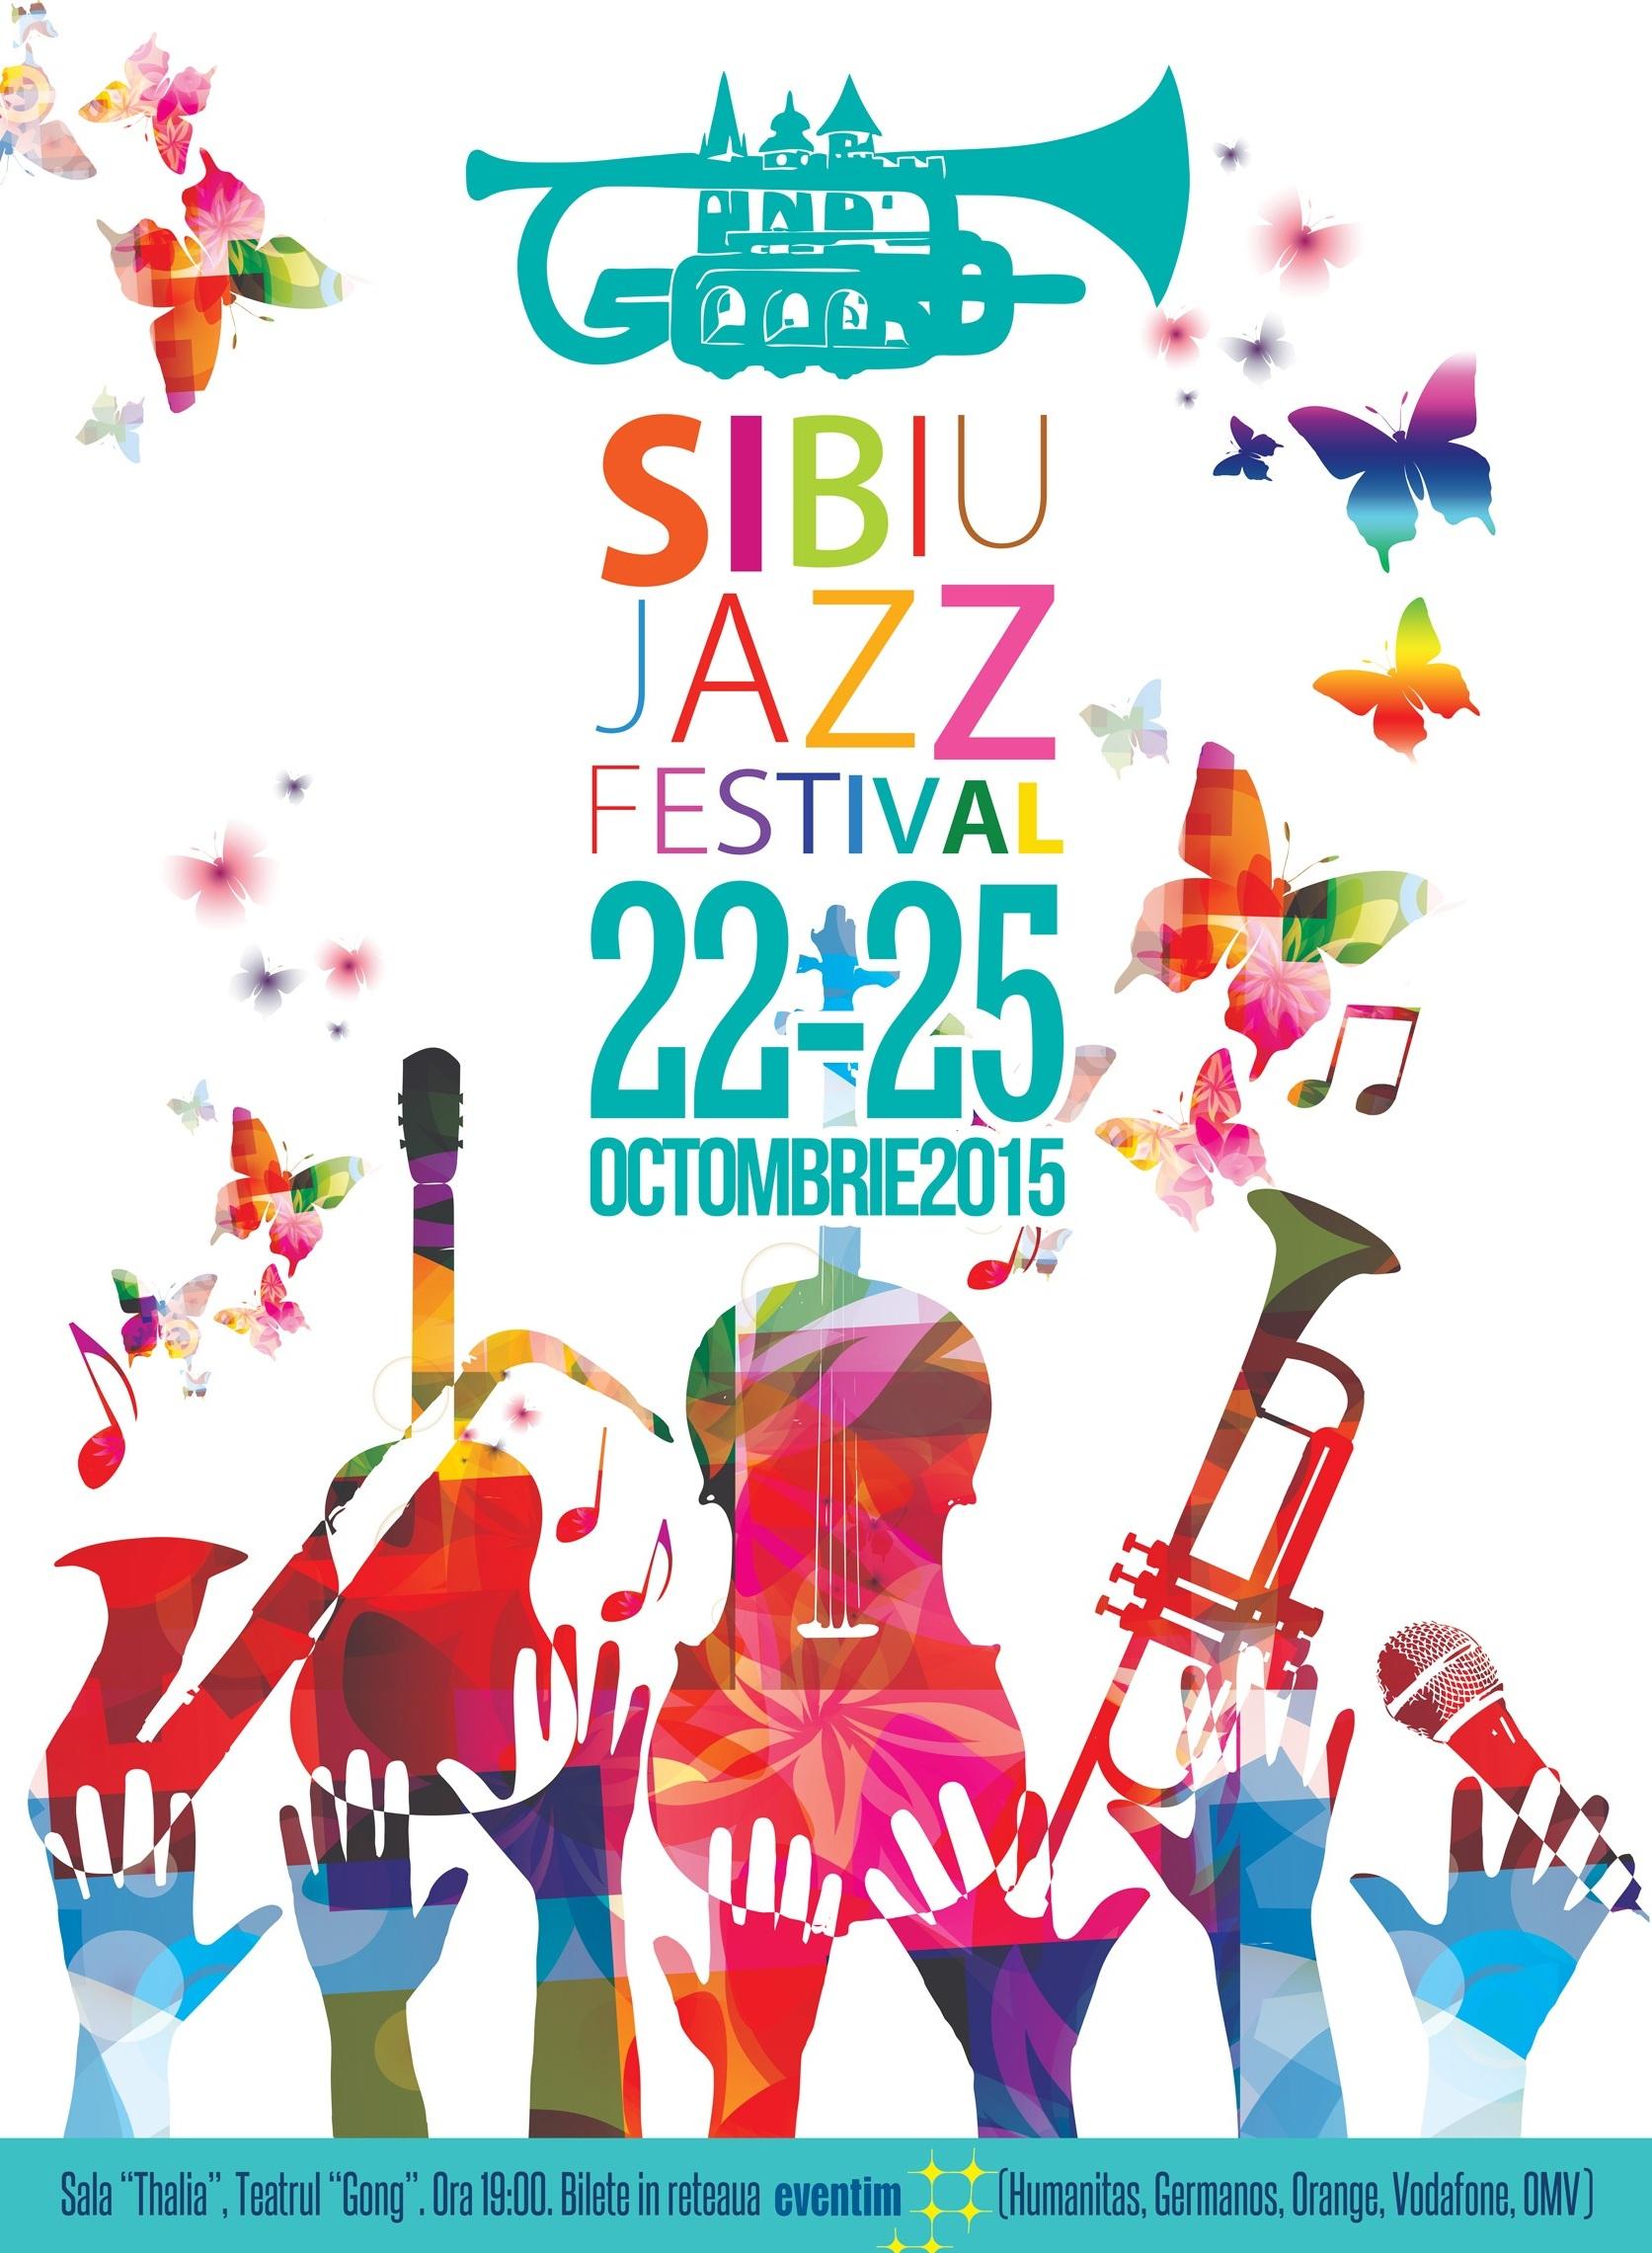 45 de ani de Sibiu Jazz Festival